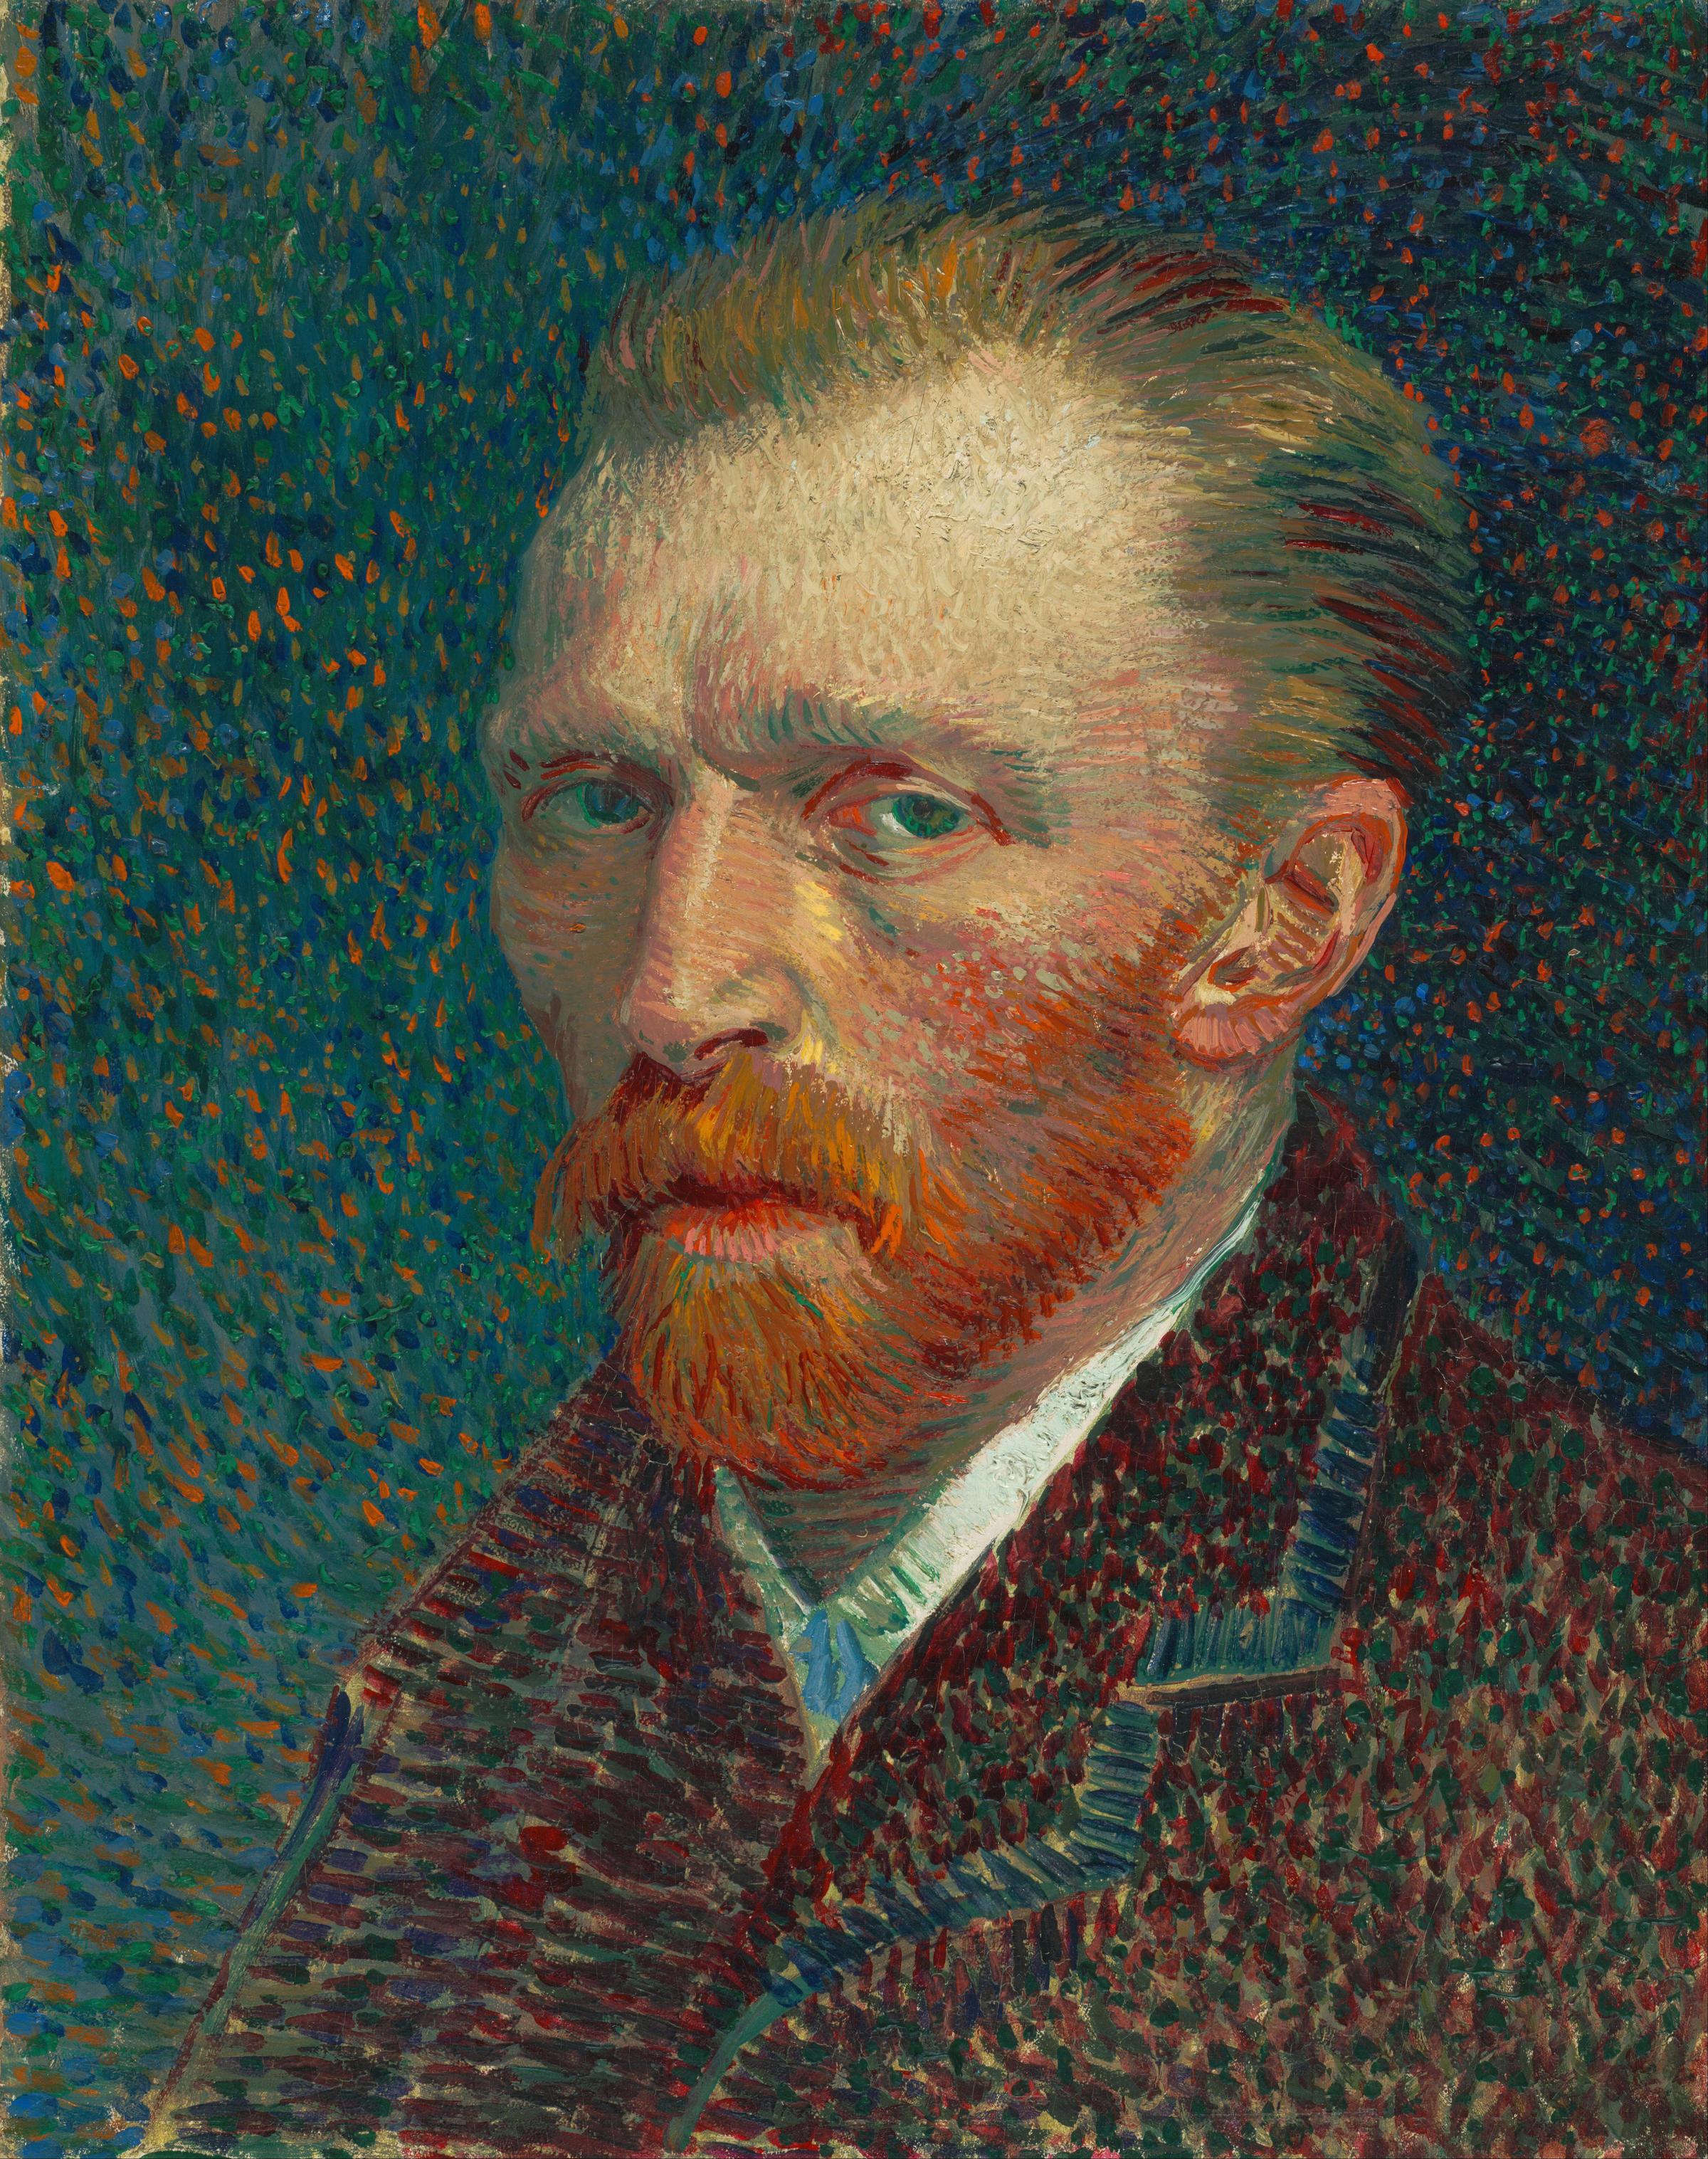 Vincent Van Gogh Self Portrait Painted In 1887